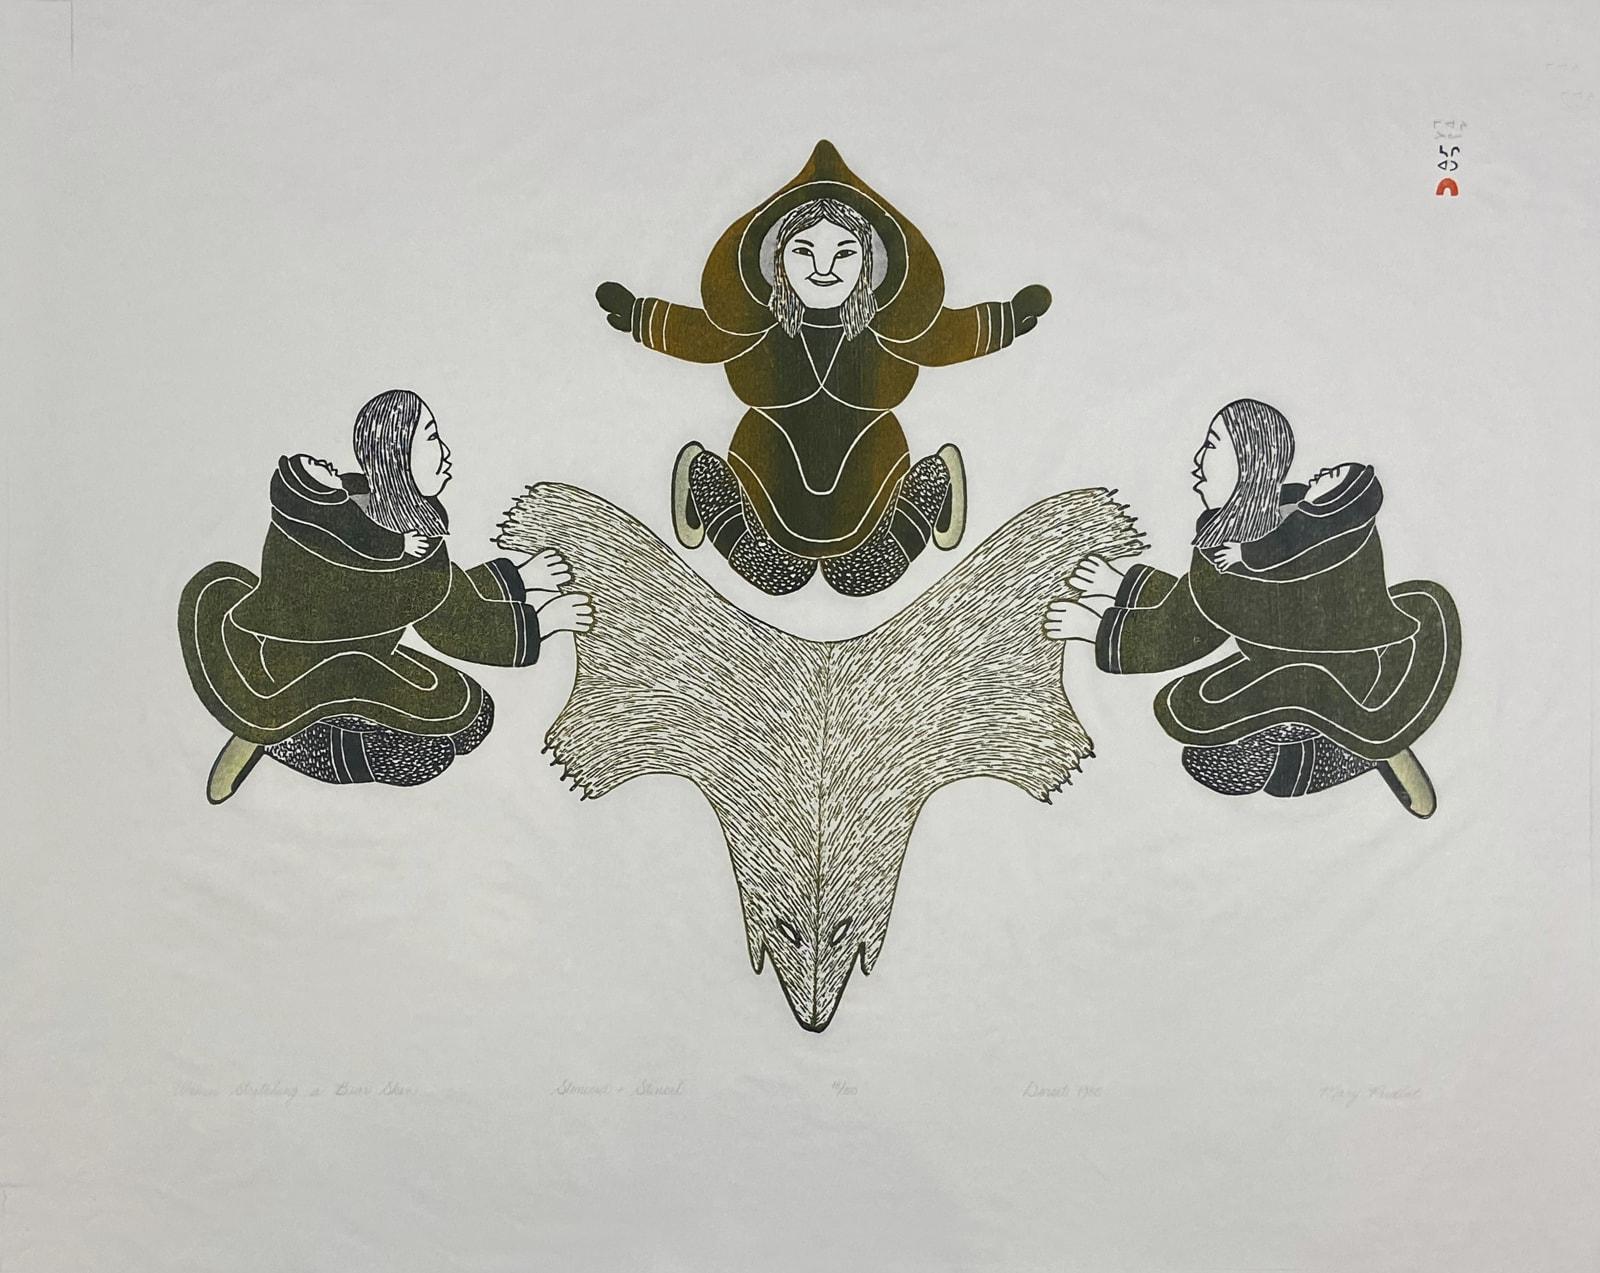 LOT 73 MARY PUDLAT (1923-2001) KINNGAIT (CAPE DORSET) Women Stretching a Bear Skin, 1985 stonecut and stencil, 24 x 30 in (61 x 76.2 cm) ESTIMATE: $350 — $500